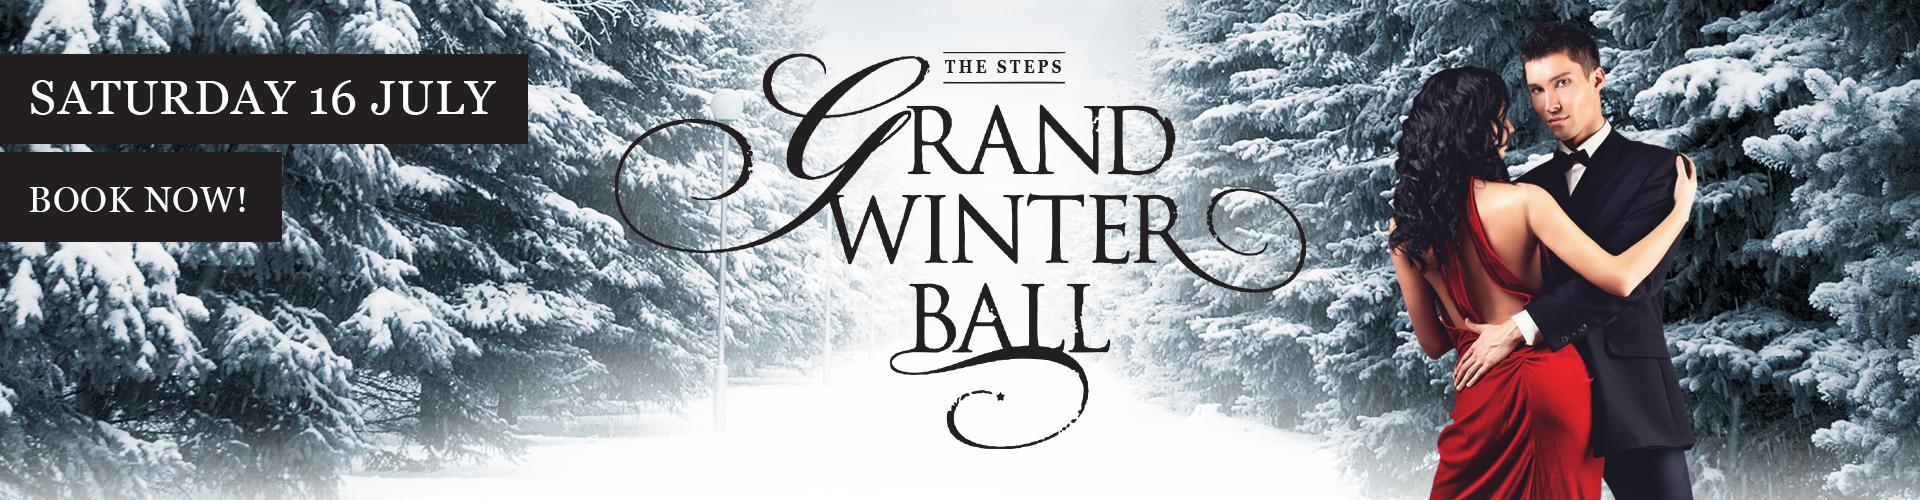 STEPS Charity | STEPS Grand Winter Ball